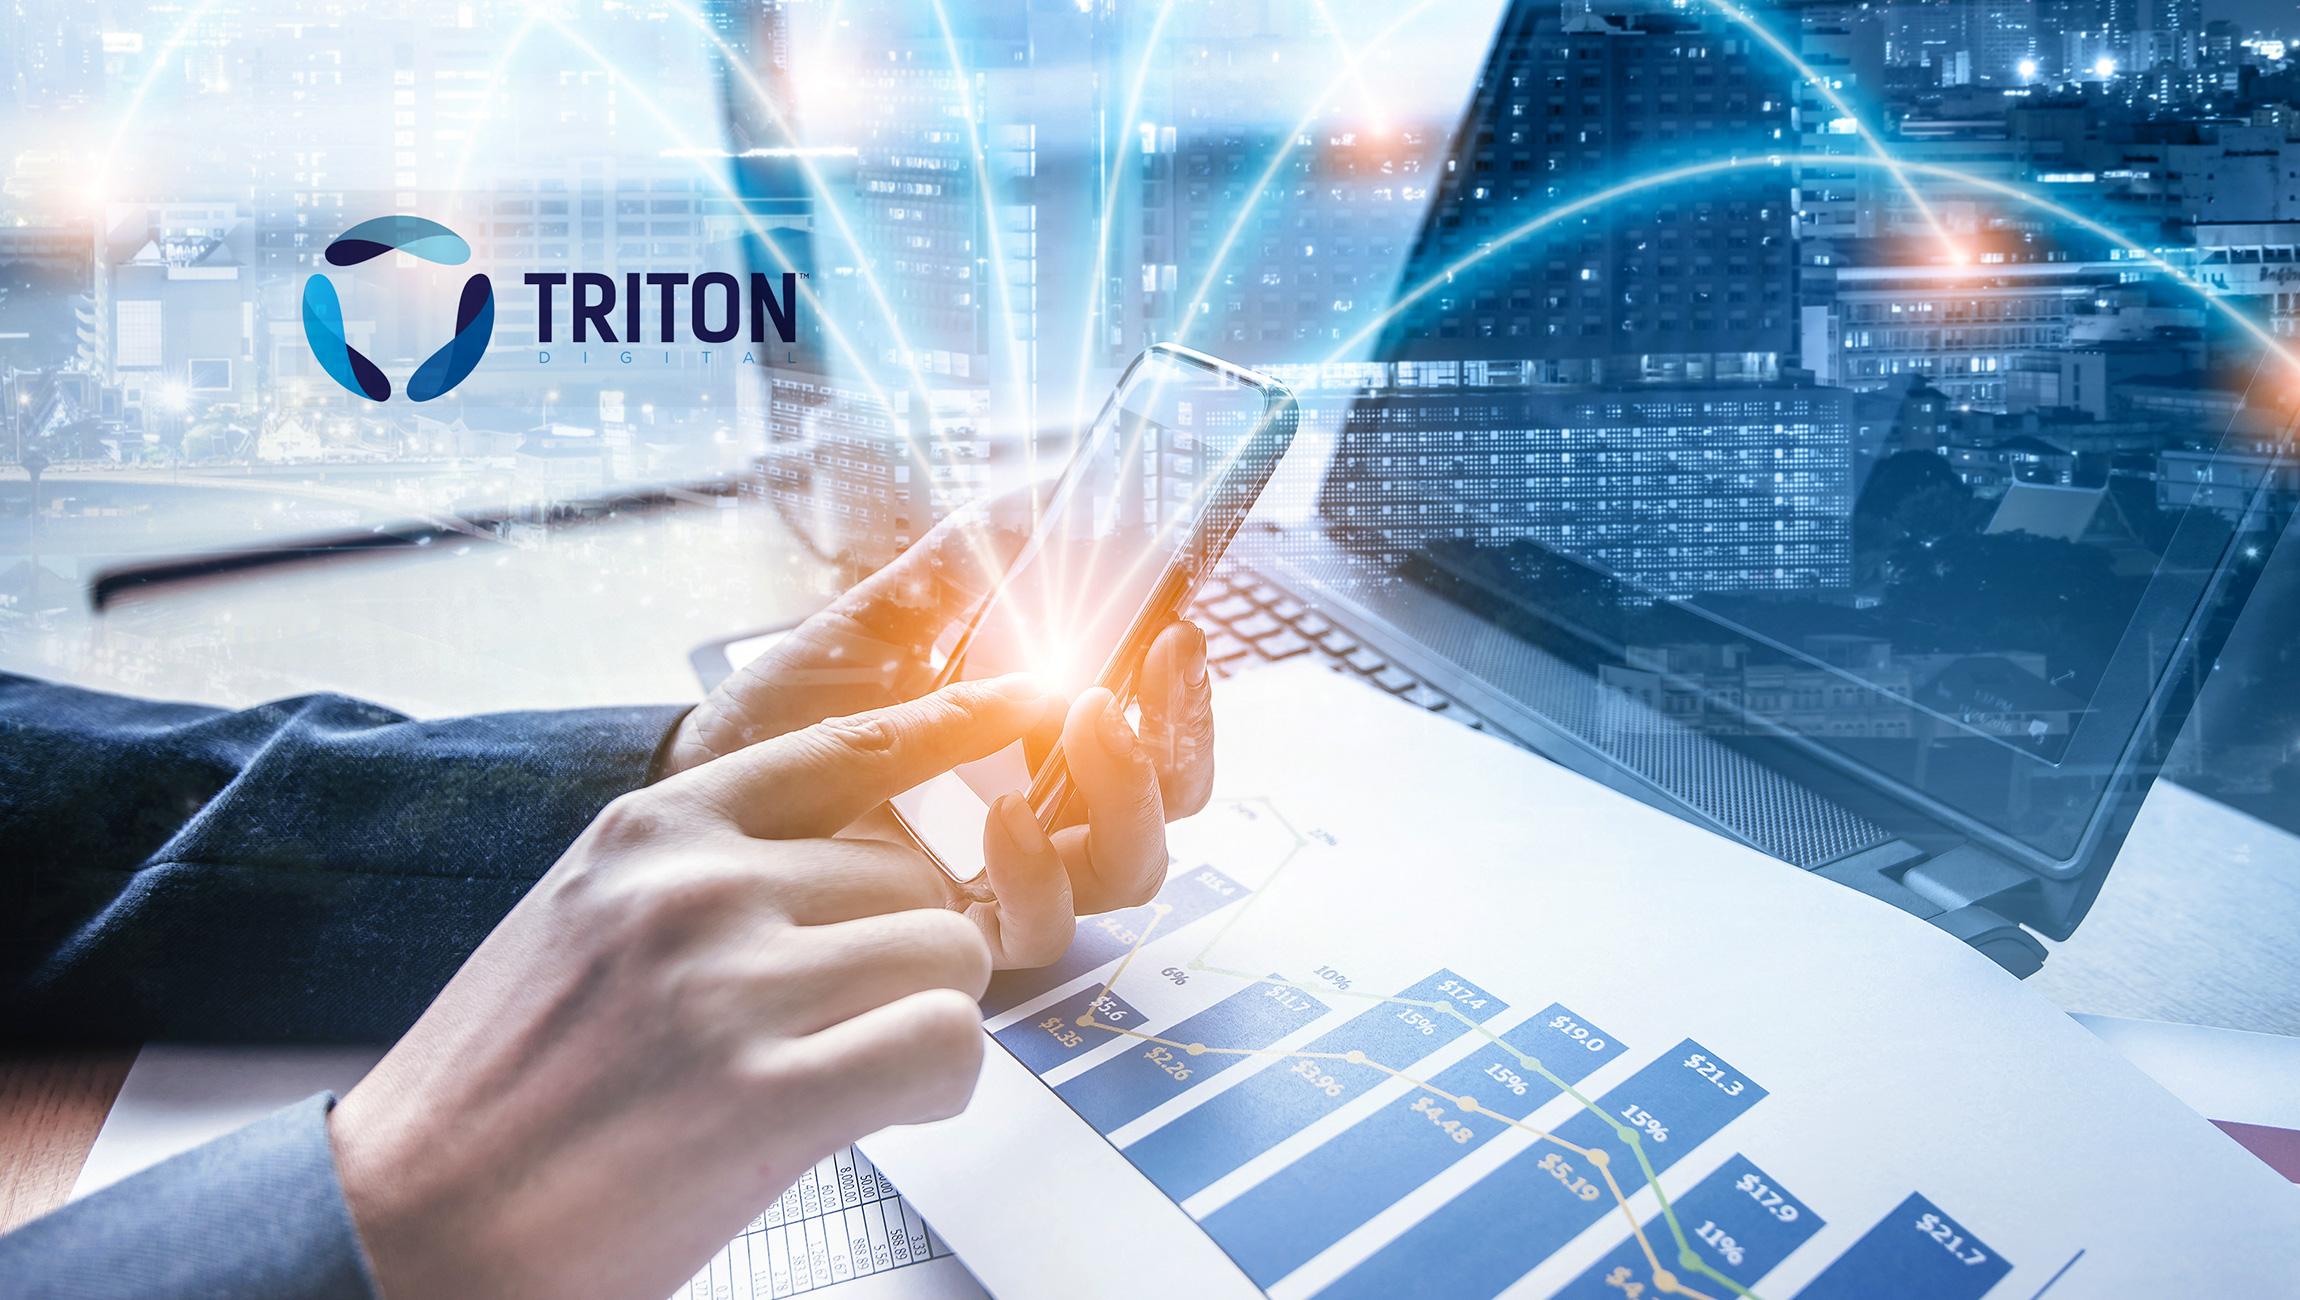 Triton Digital Integrates Centro's Basis Platform with the a2x Programmatic Marketplace